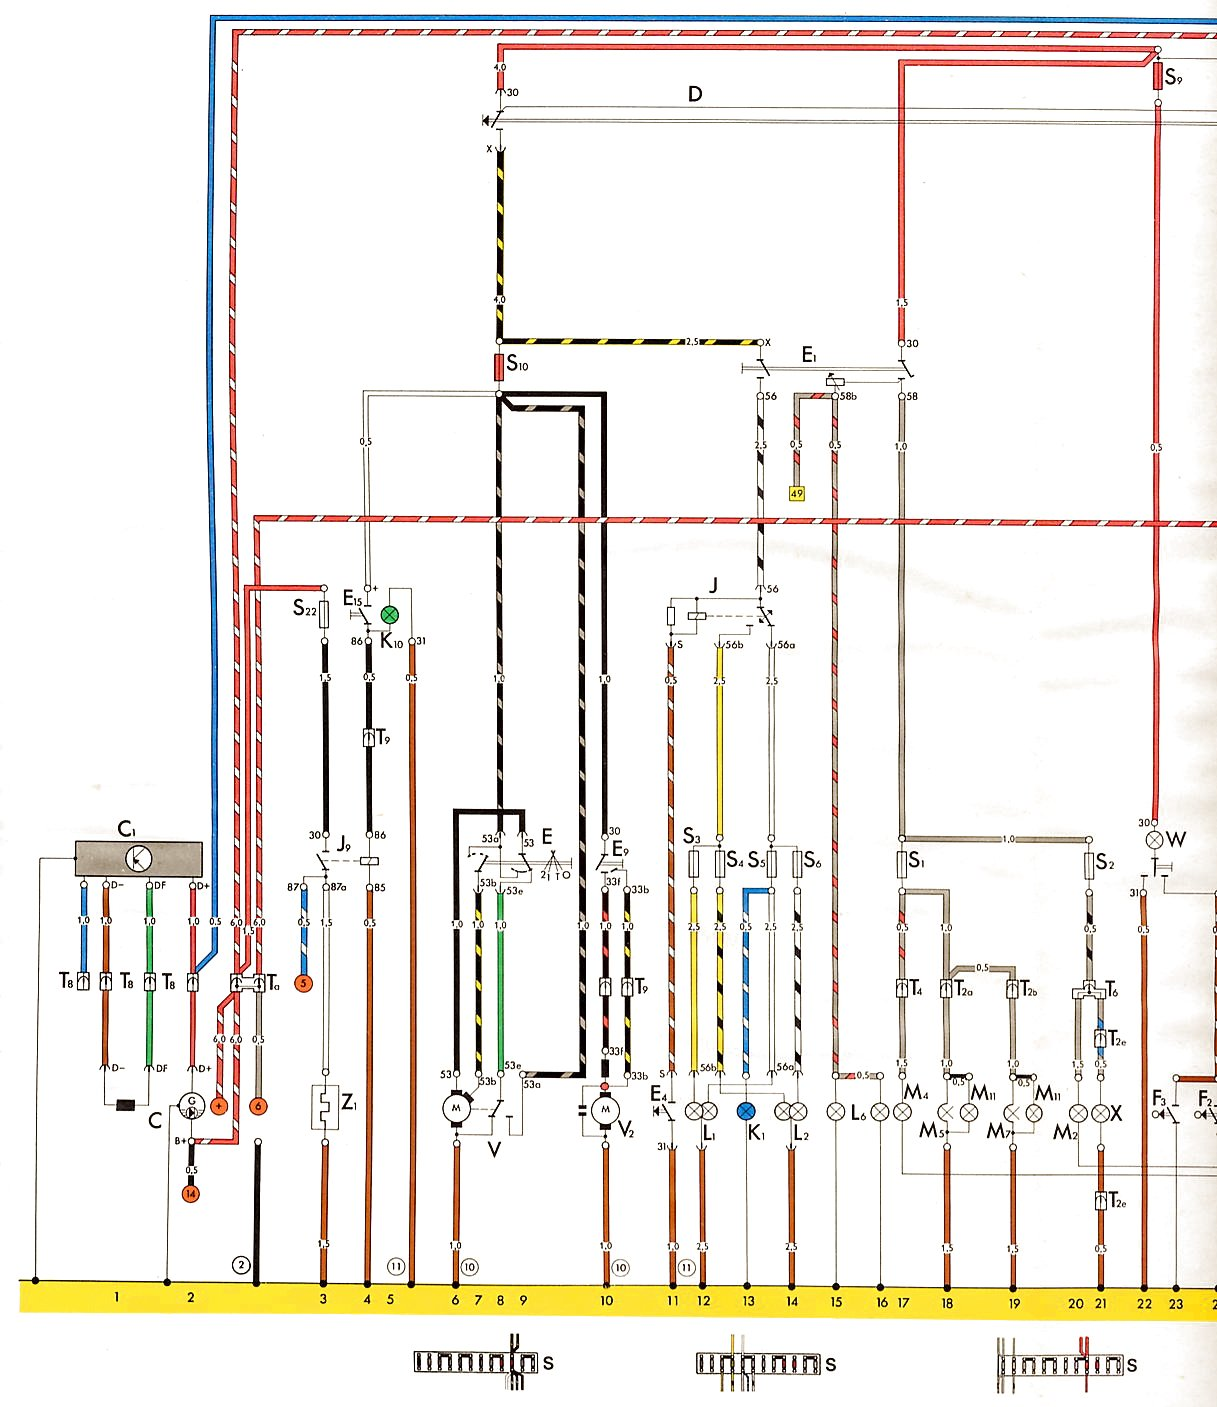 hight resolution of 73 super beetle voltage regulator shoptalkforums com rh shoptalkforums com dodge voltage regulator wiring diagram ford